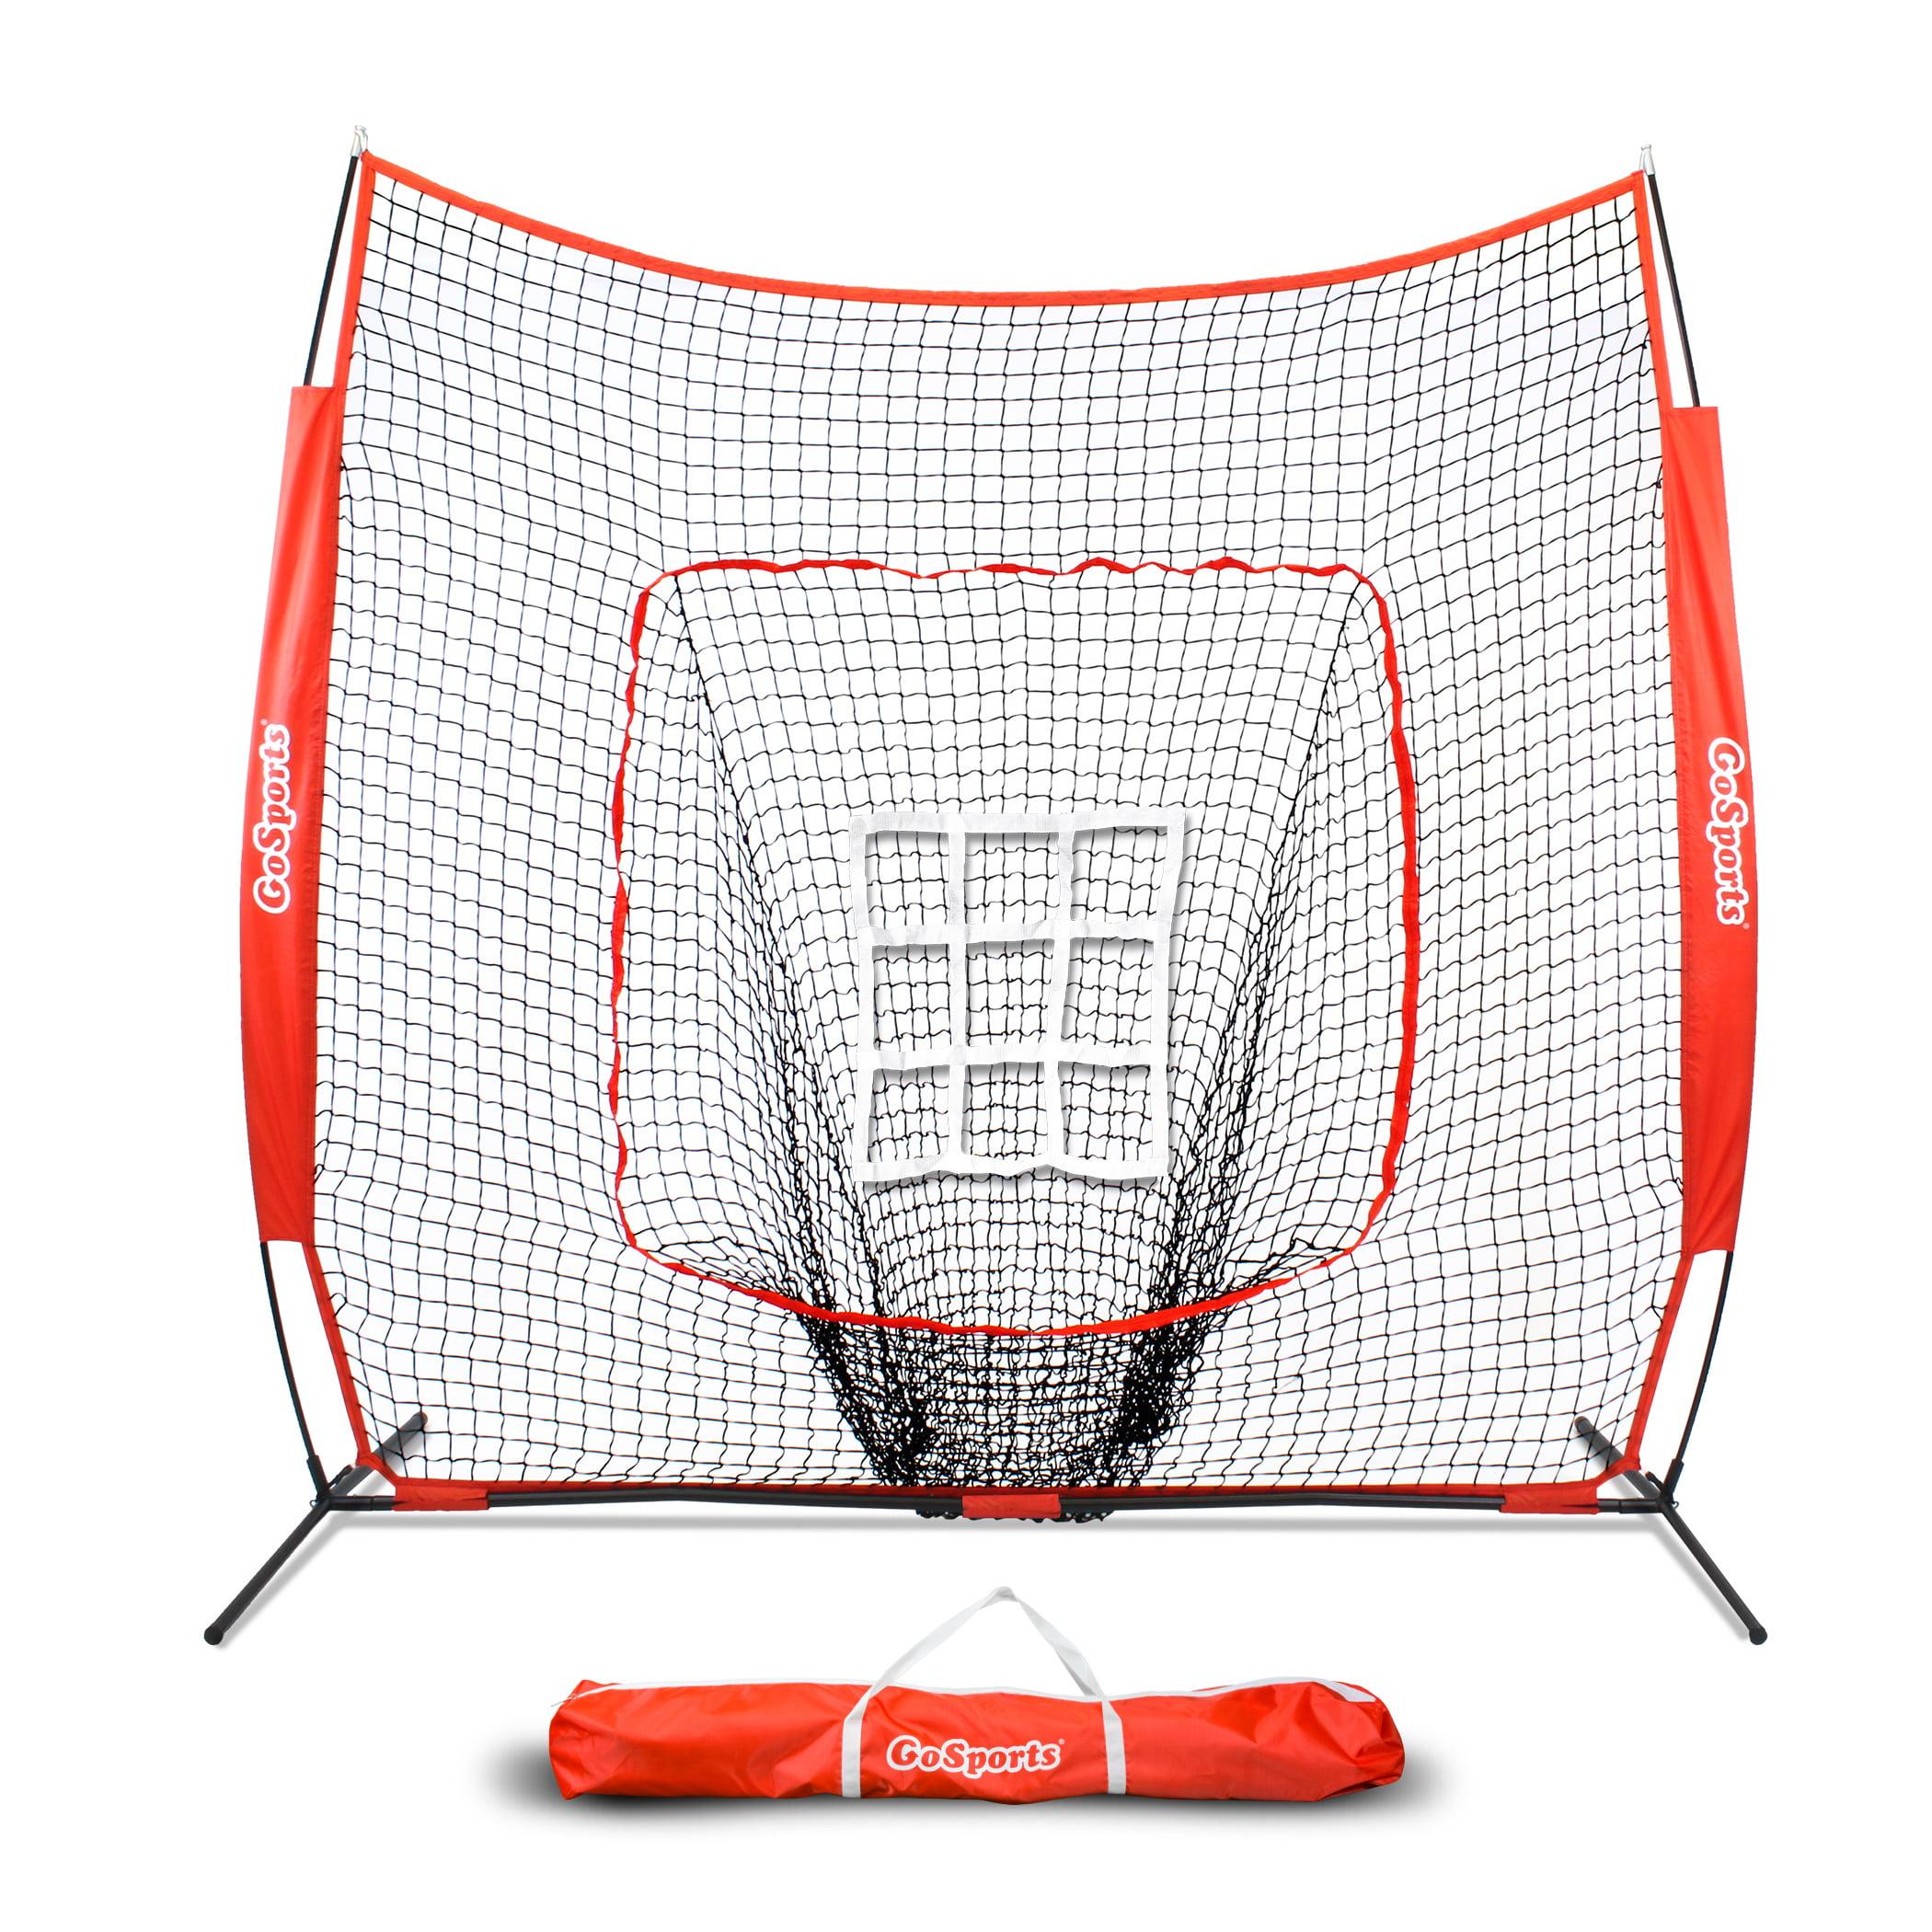 GoSports 7'x7' Baseball & Softball Practice Pitching & Fielding Net with Bonus Strike Zone